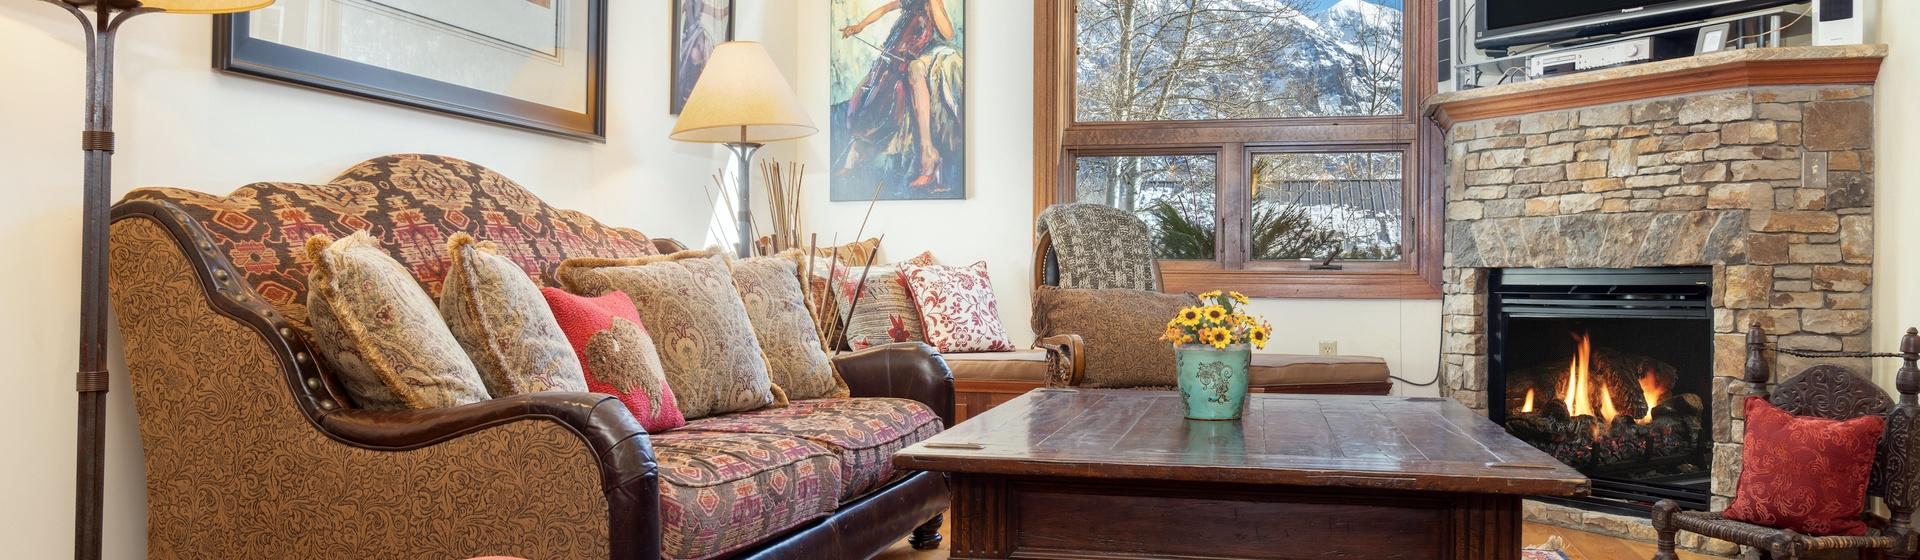 1.01-telluride-tres-casas-B-living-room-web.jpg